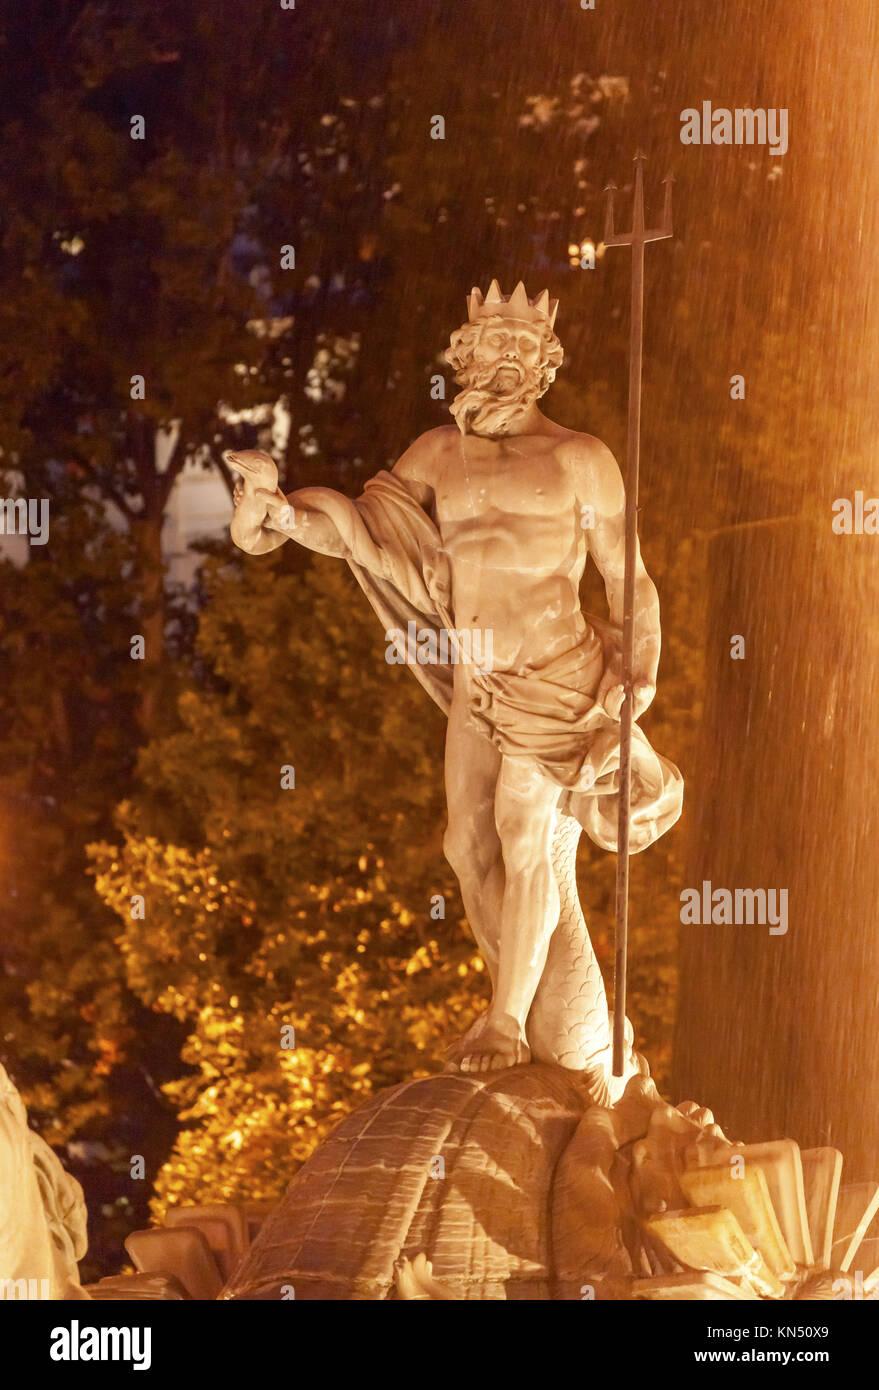 Neptune with Trident Snake, Roman God, Statue Fountain Night Plaza Canovas del Castillo Madrid Spain. Neptune Statue - Stock Image